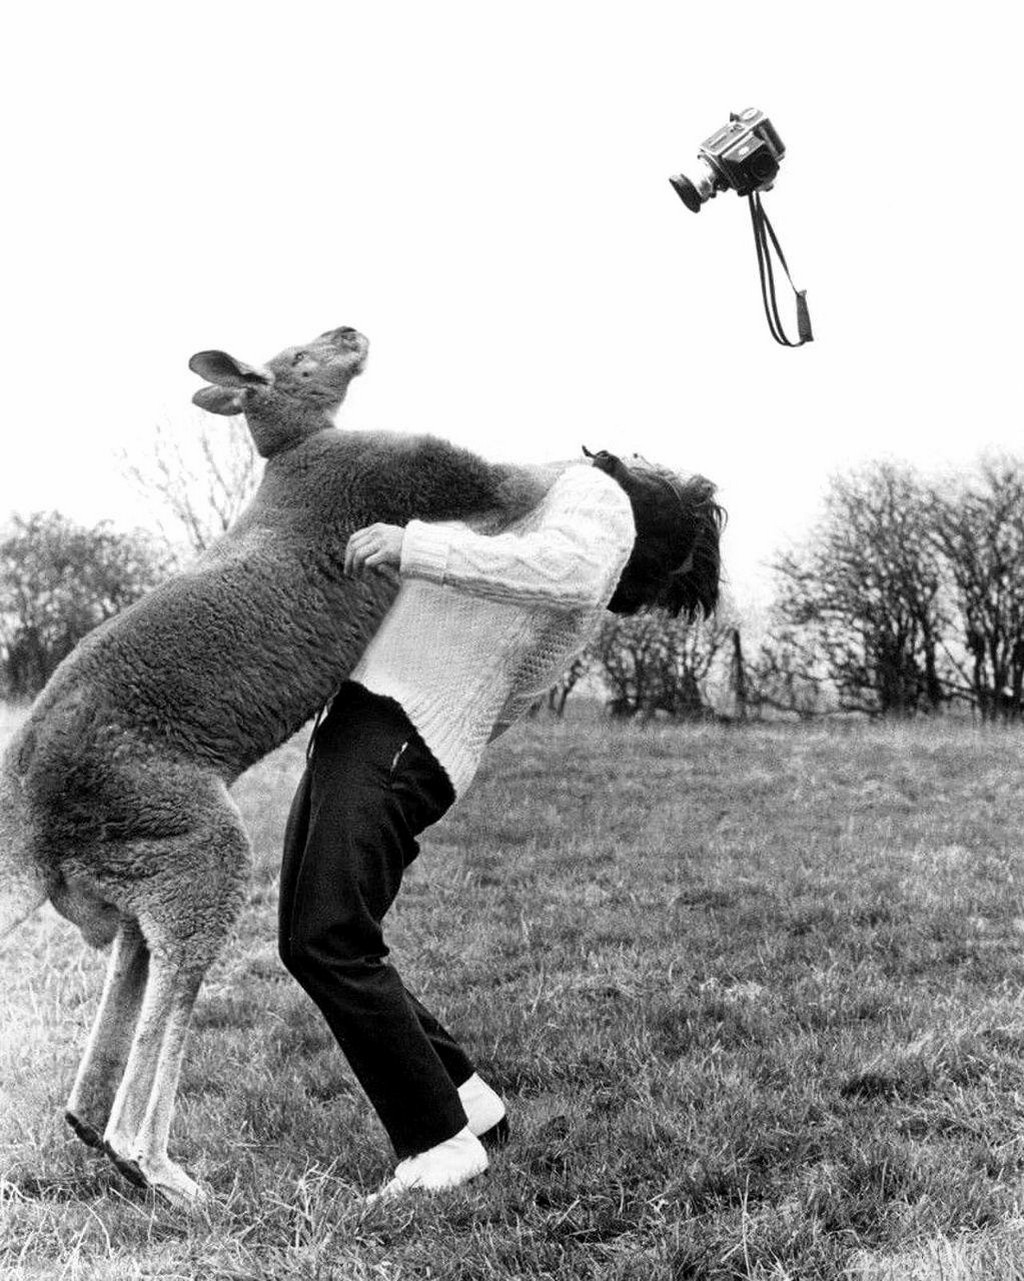 Кенгуру против фотографа, Англия, 1967. Фотографы Воллер Эрнст и Джон Дрисдейл